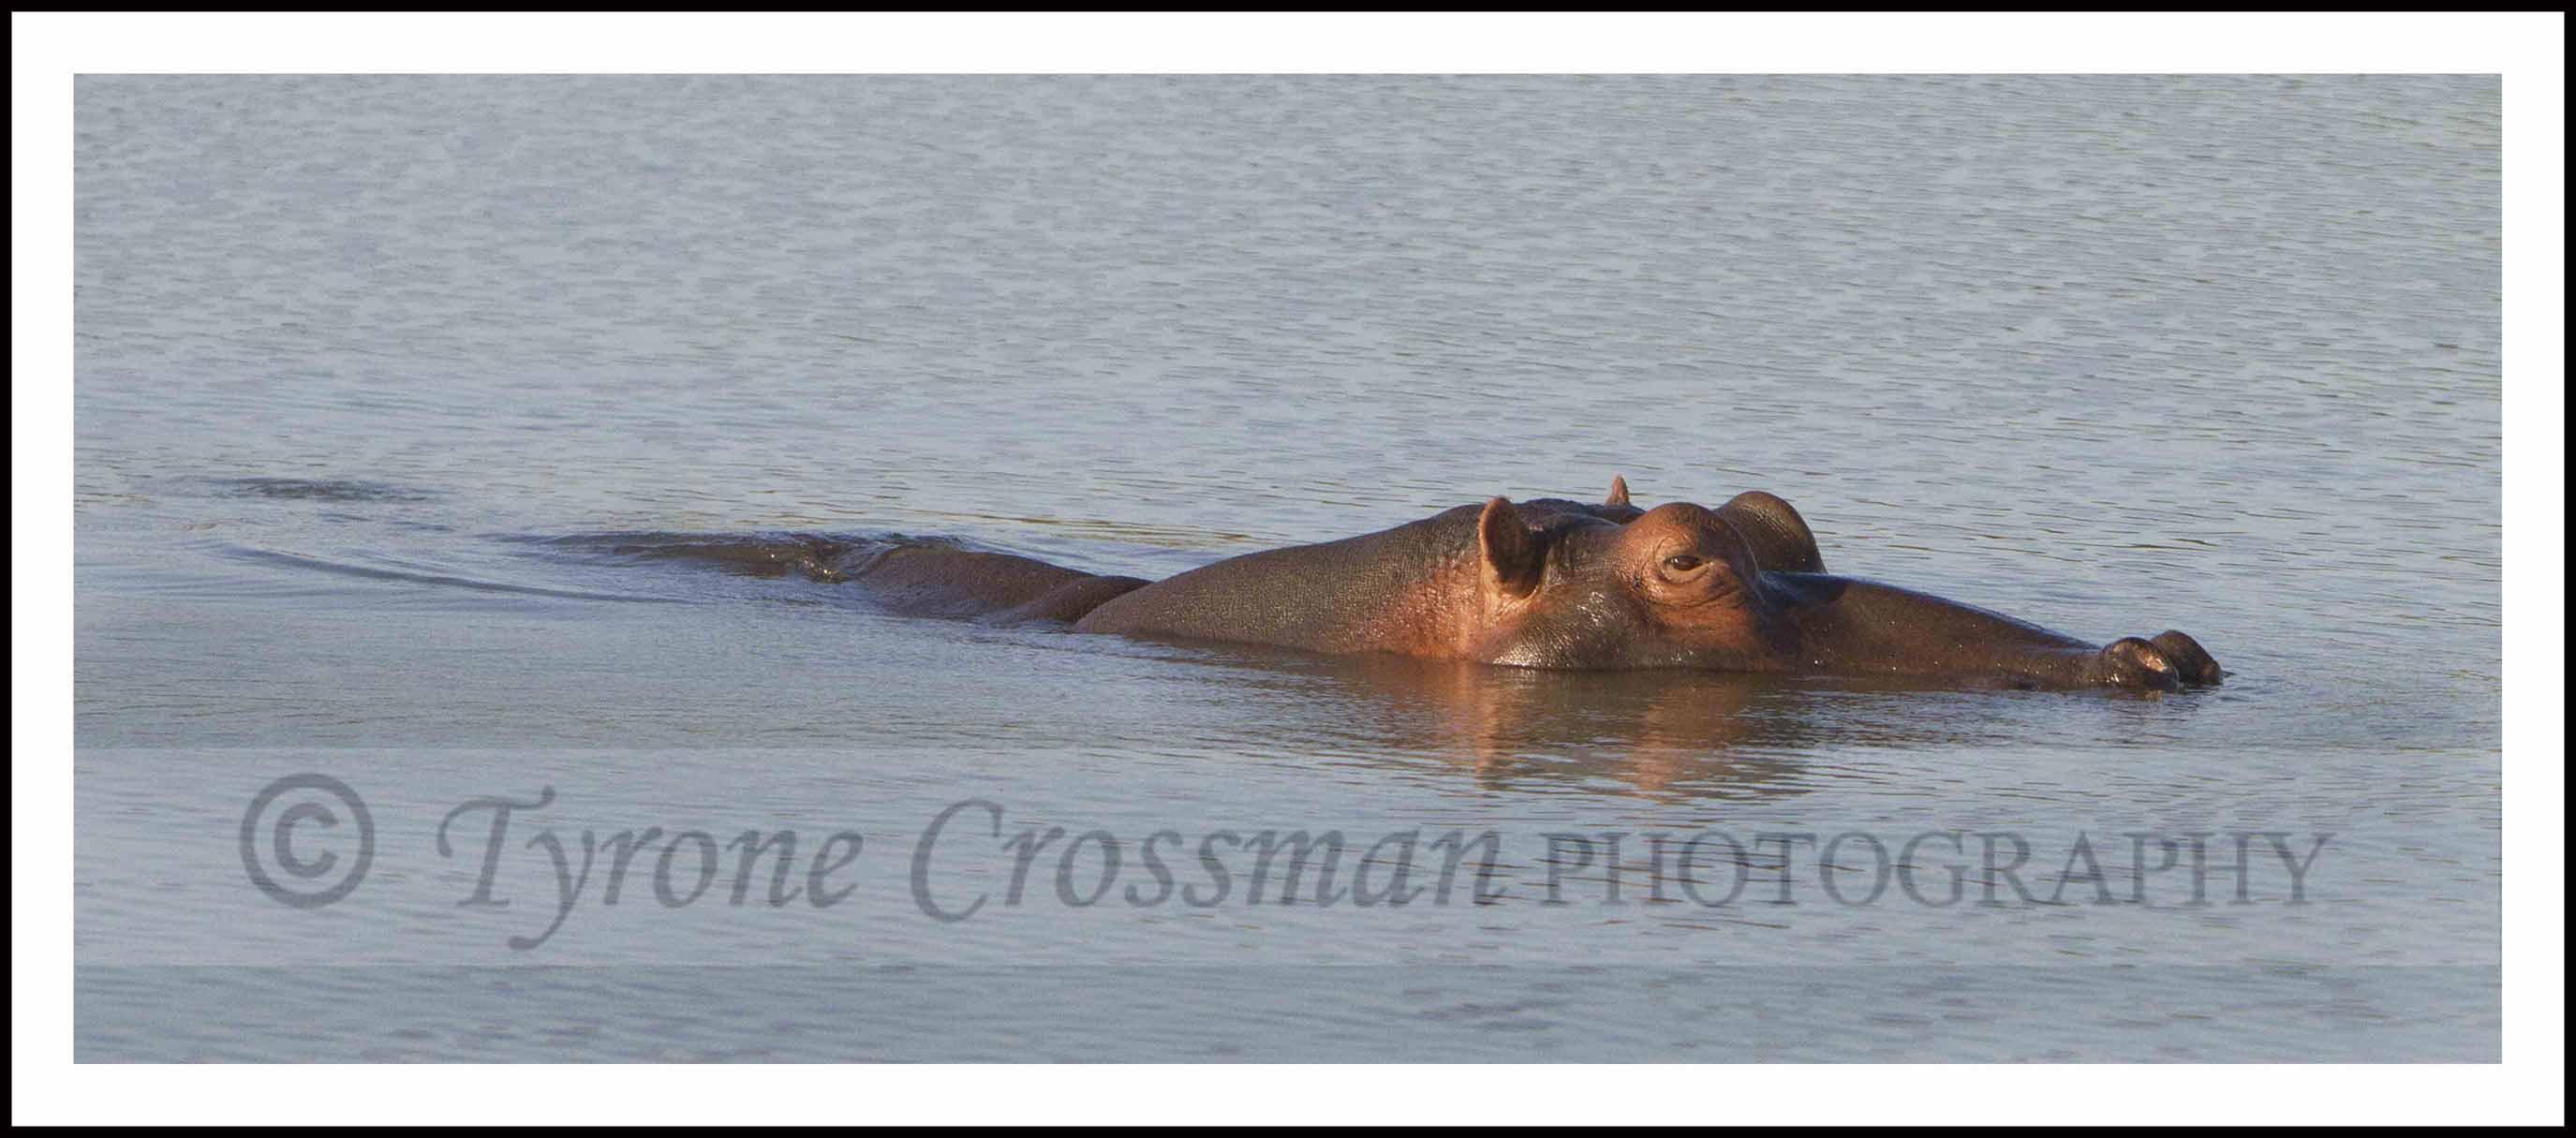 Hippo bathing at Springbok Lodge, outside Ladysmith, Kwa Zulu Natal.